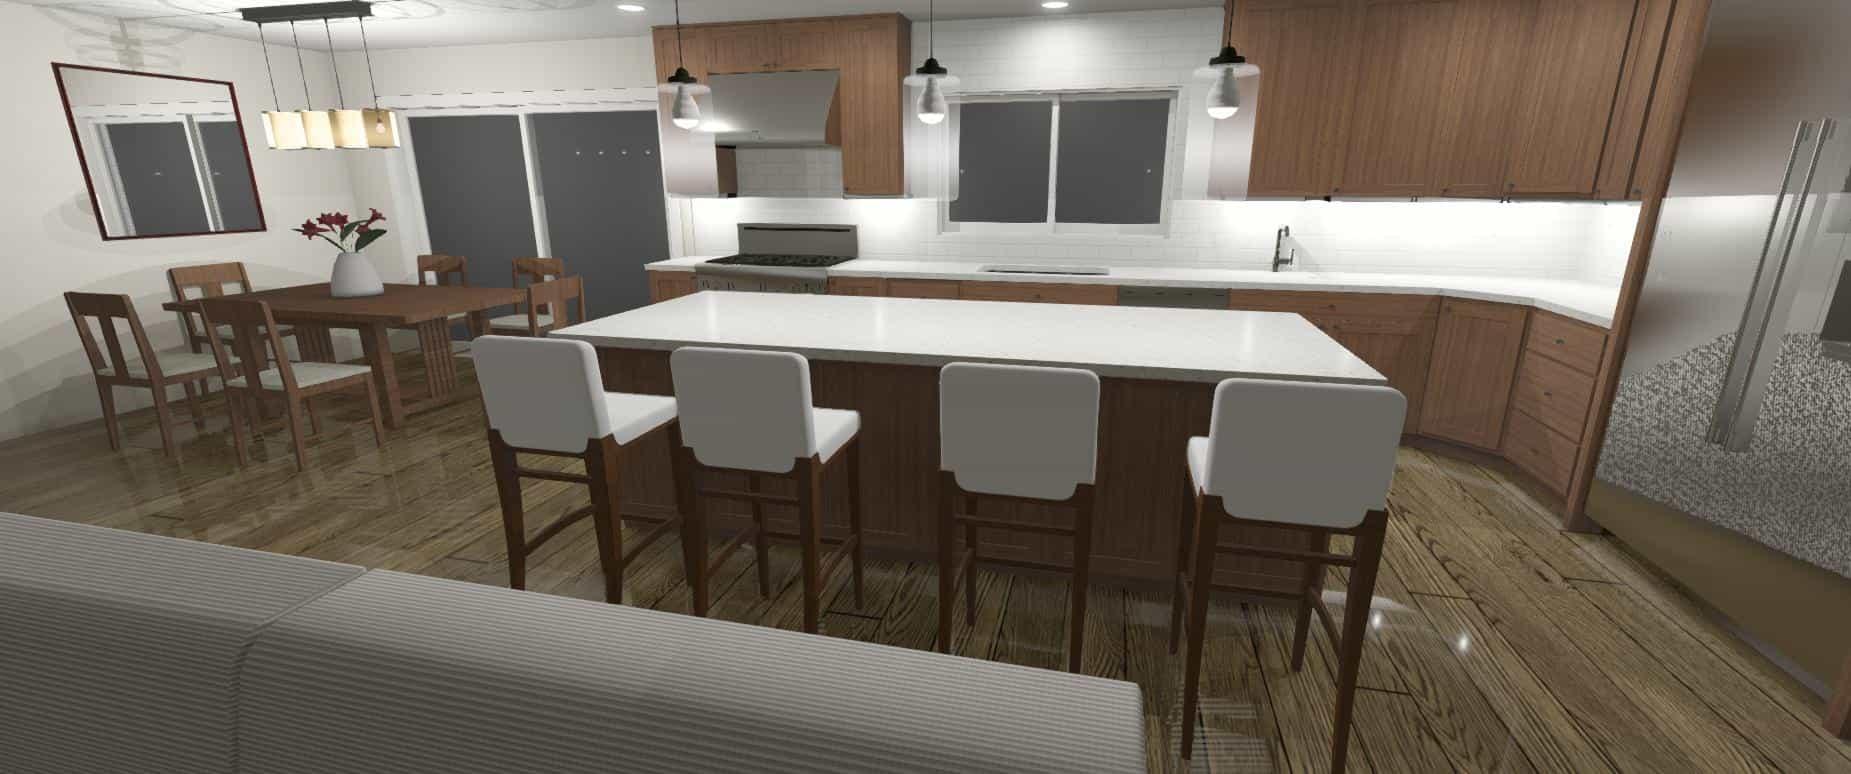 3D Model of a Kitchen - Designers Northwest